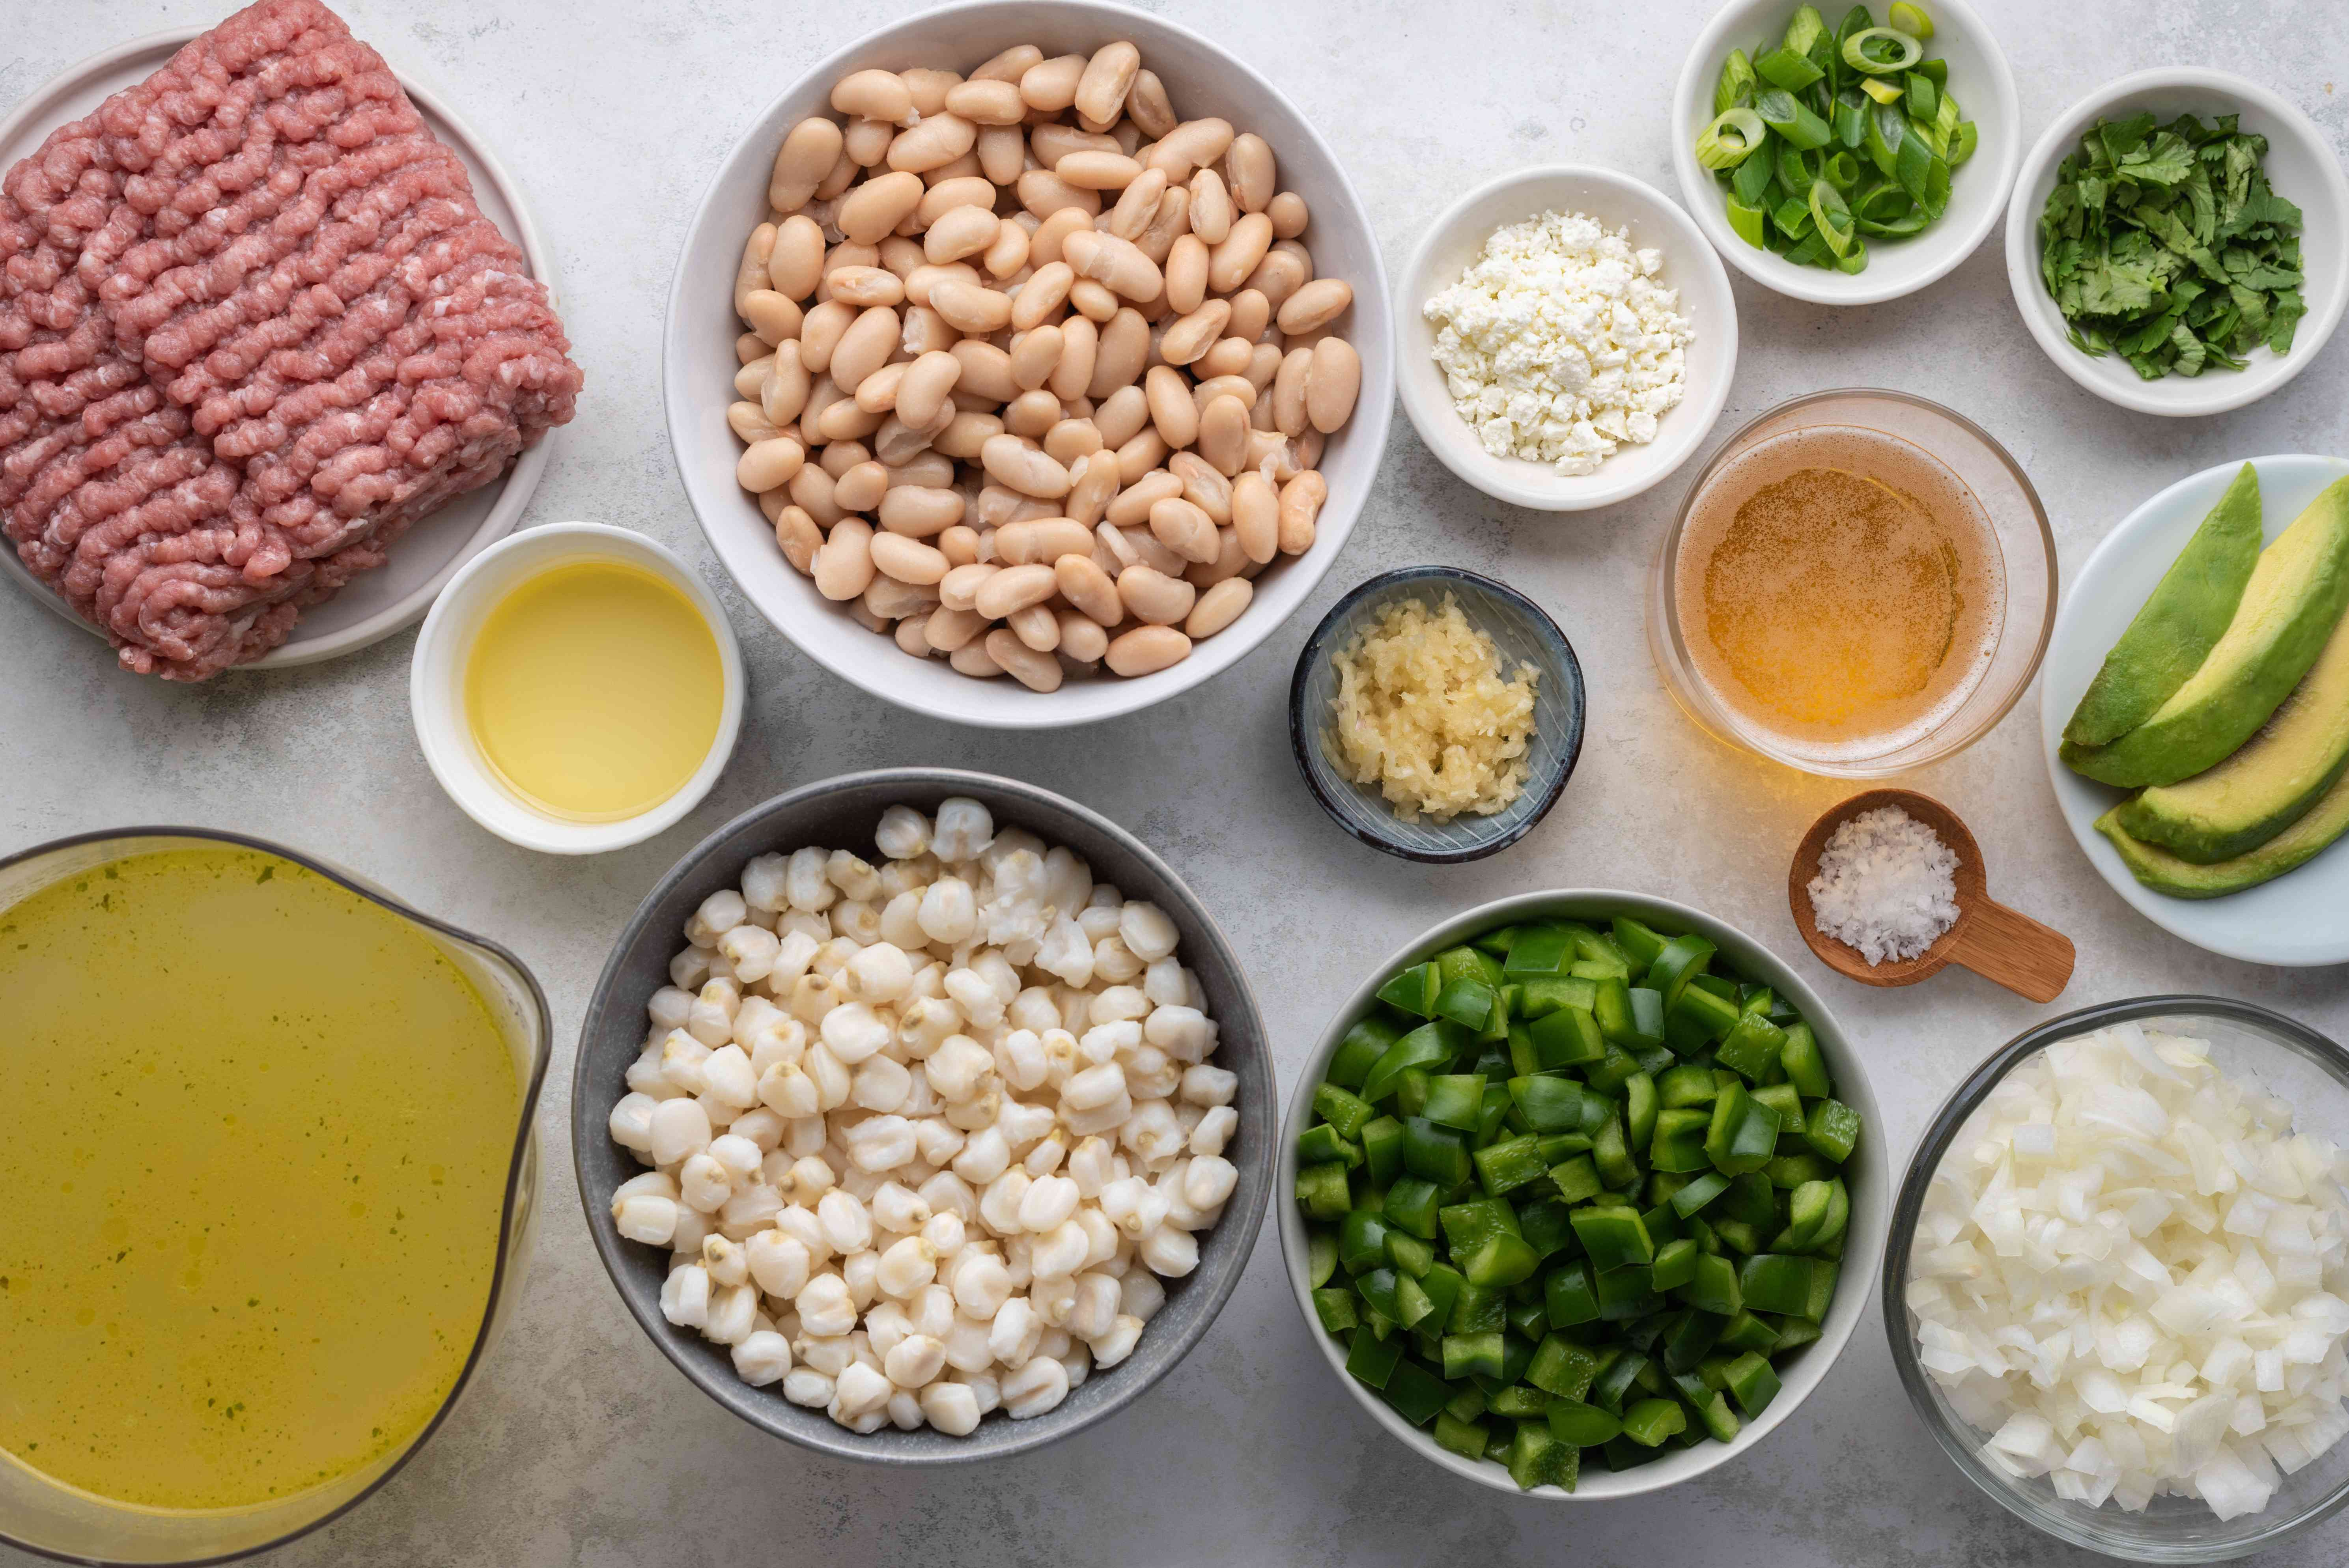 Ingredients to make green turkey chili